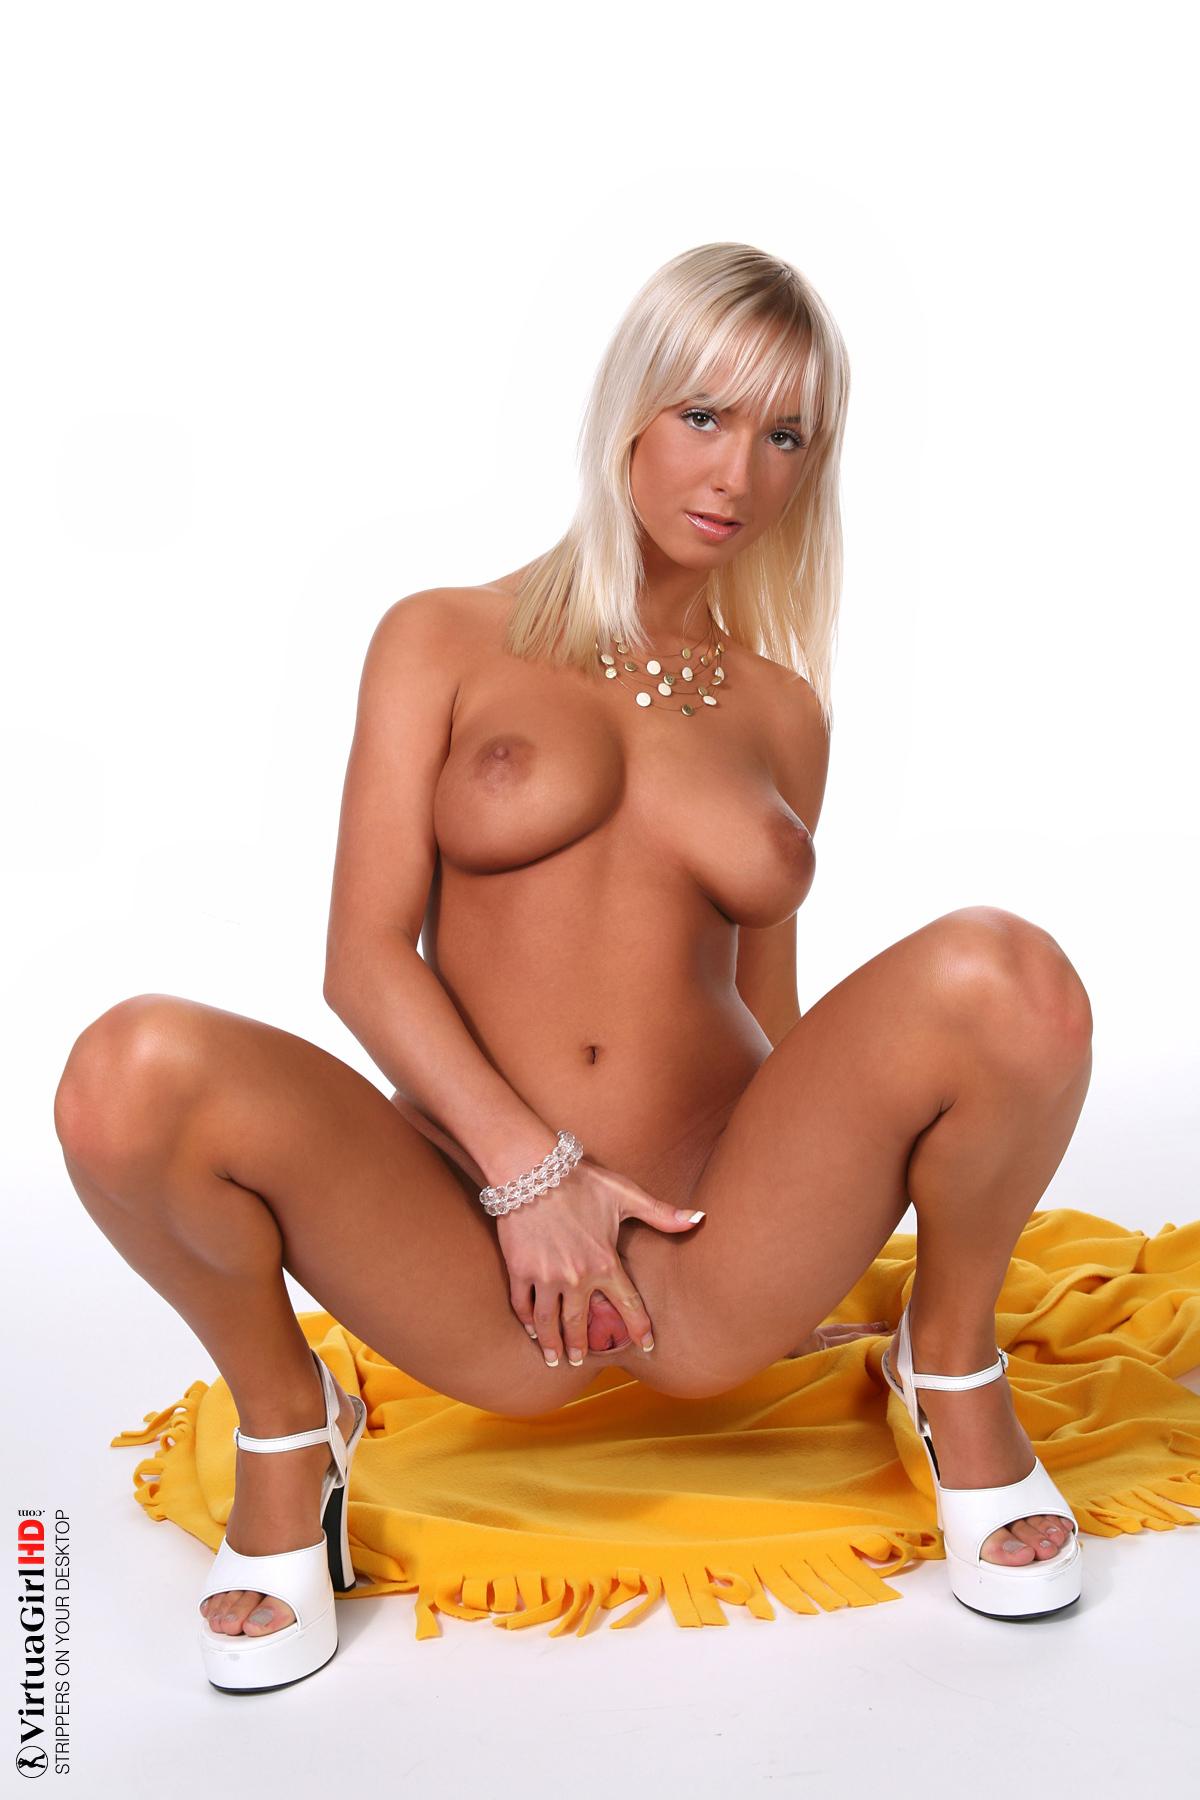 sexy porn wallpaper hd